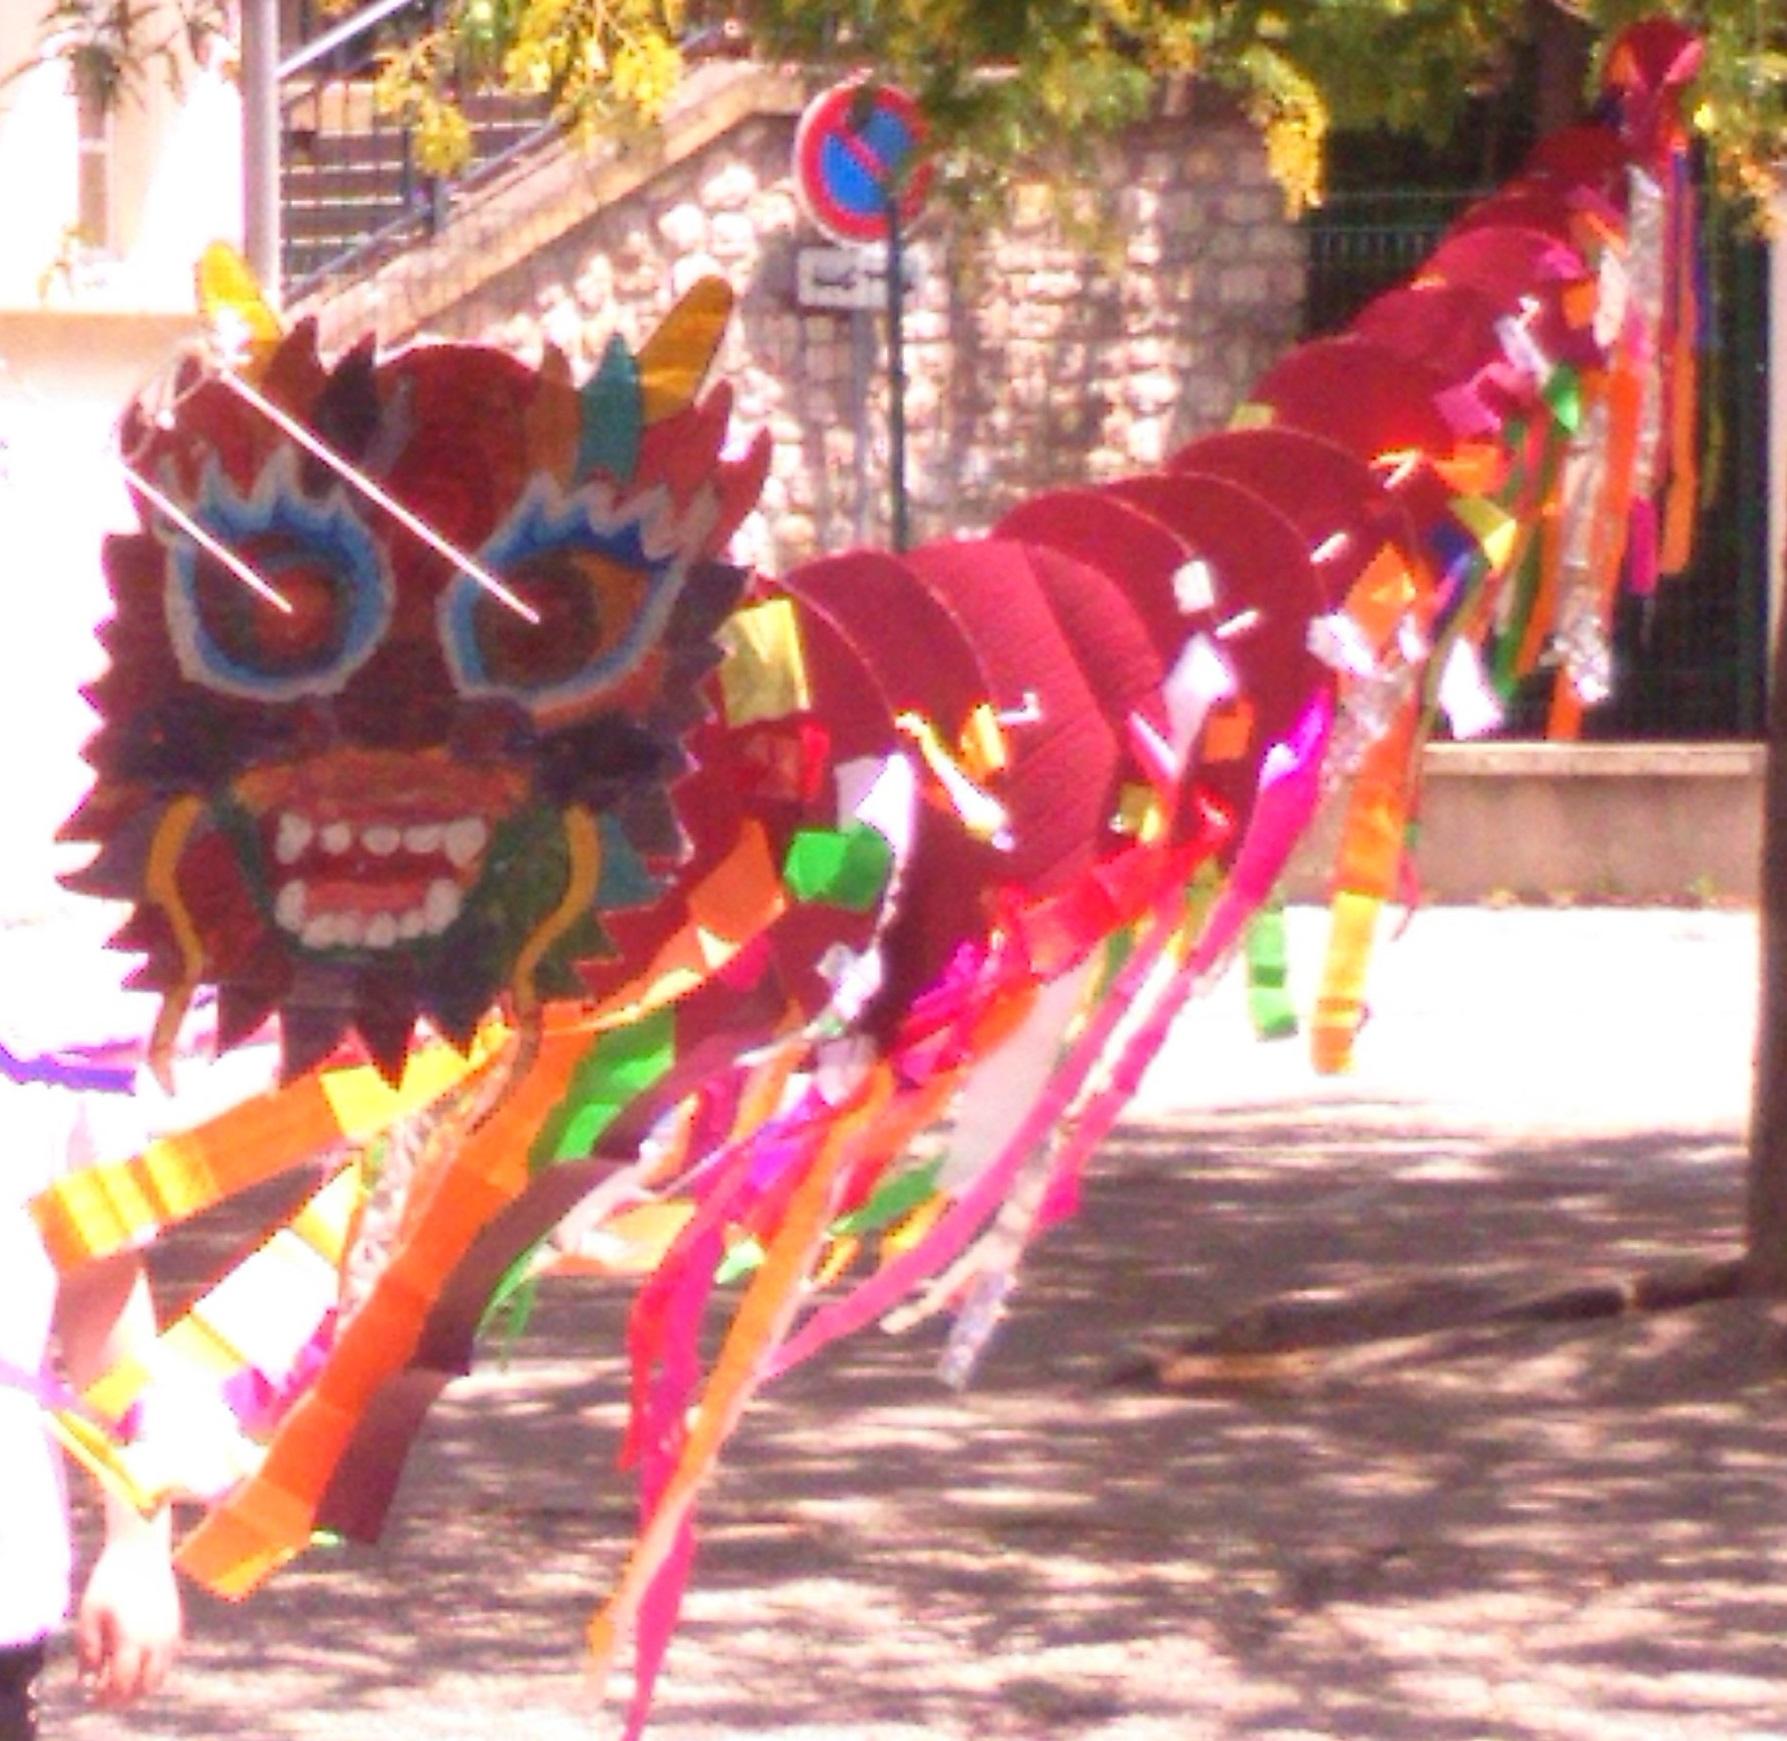 Dragon Chinois Cerf Volant La Fouine En Clis